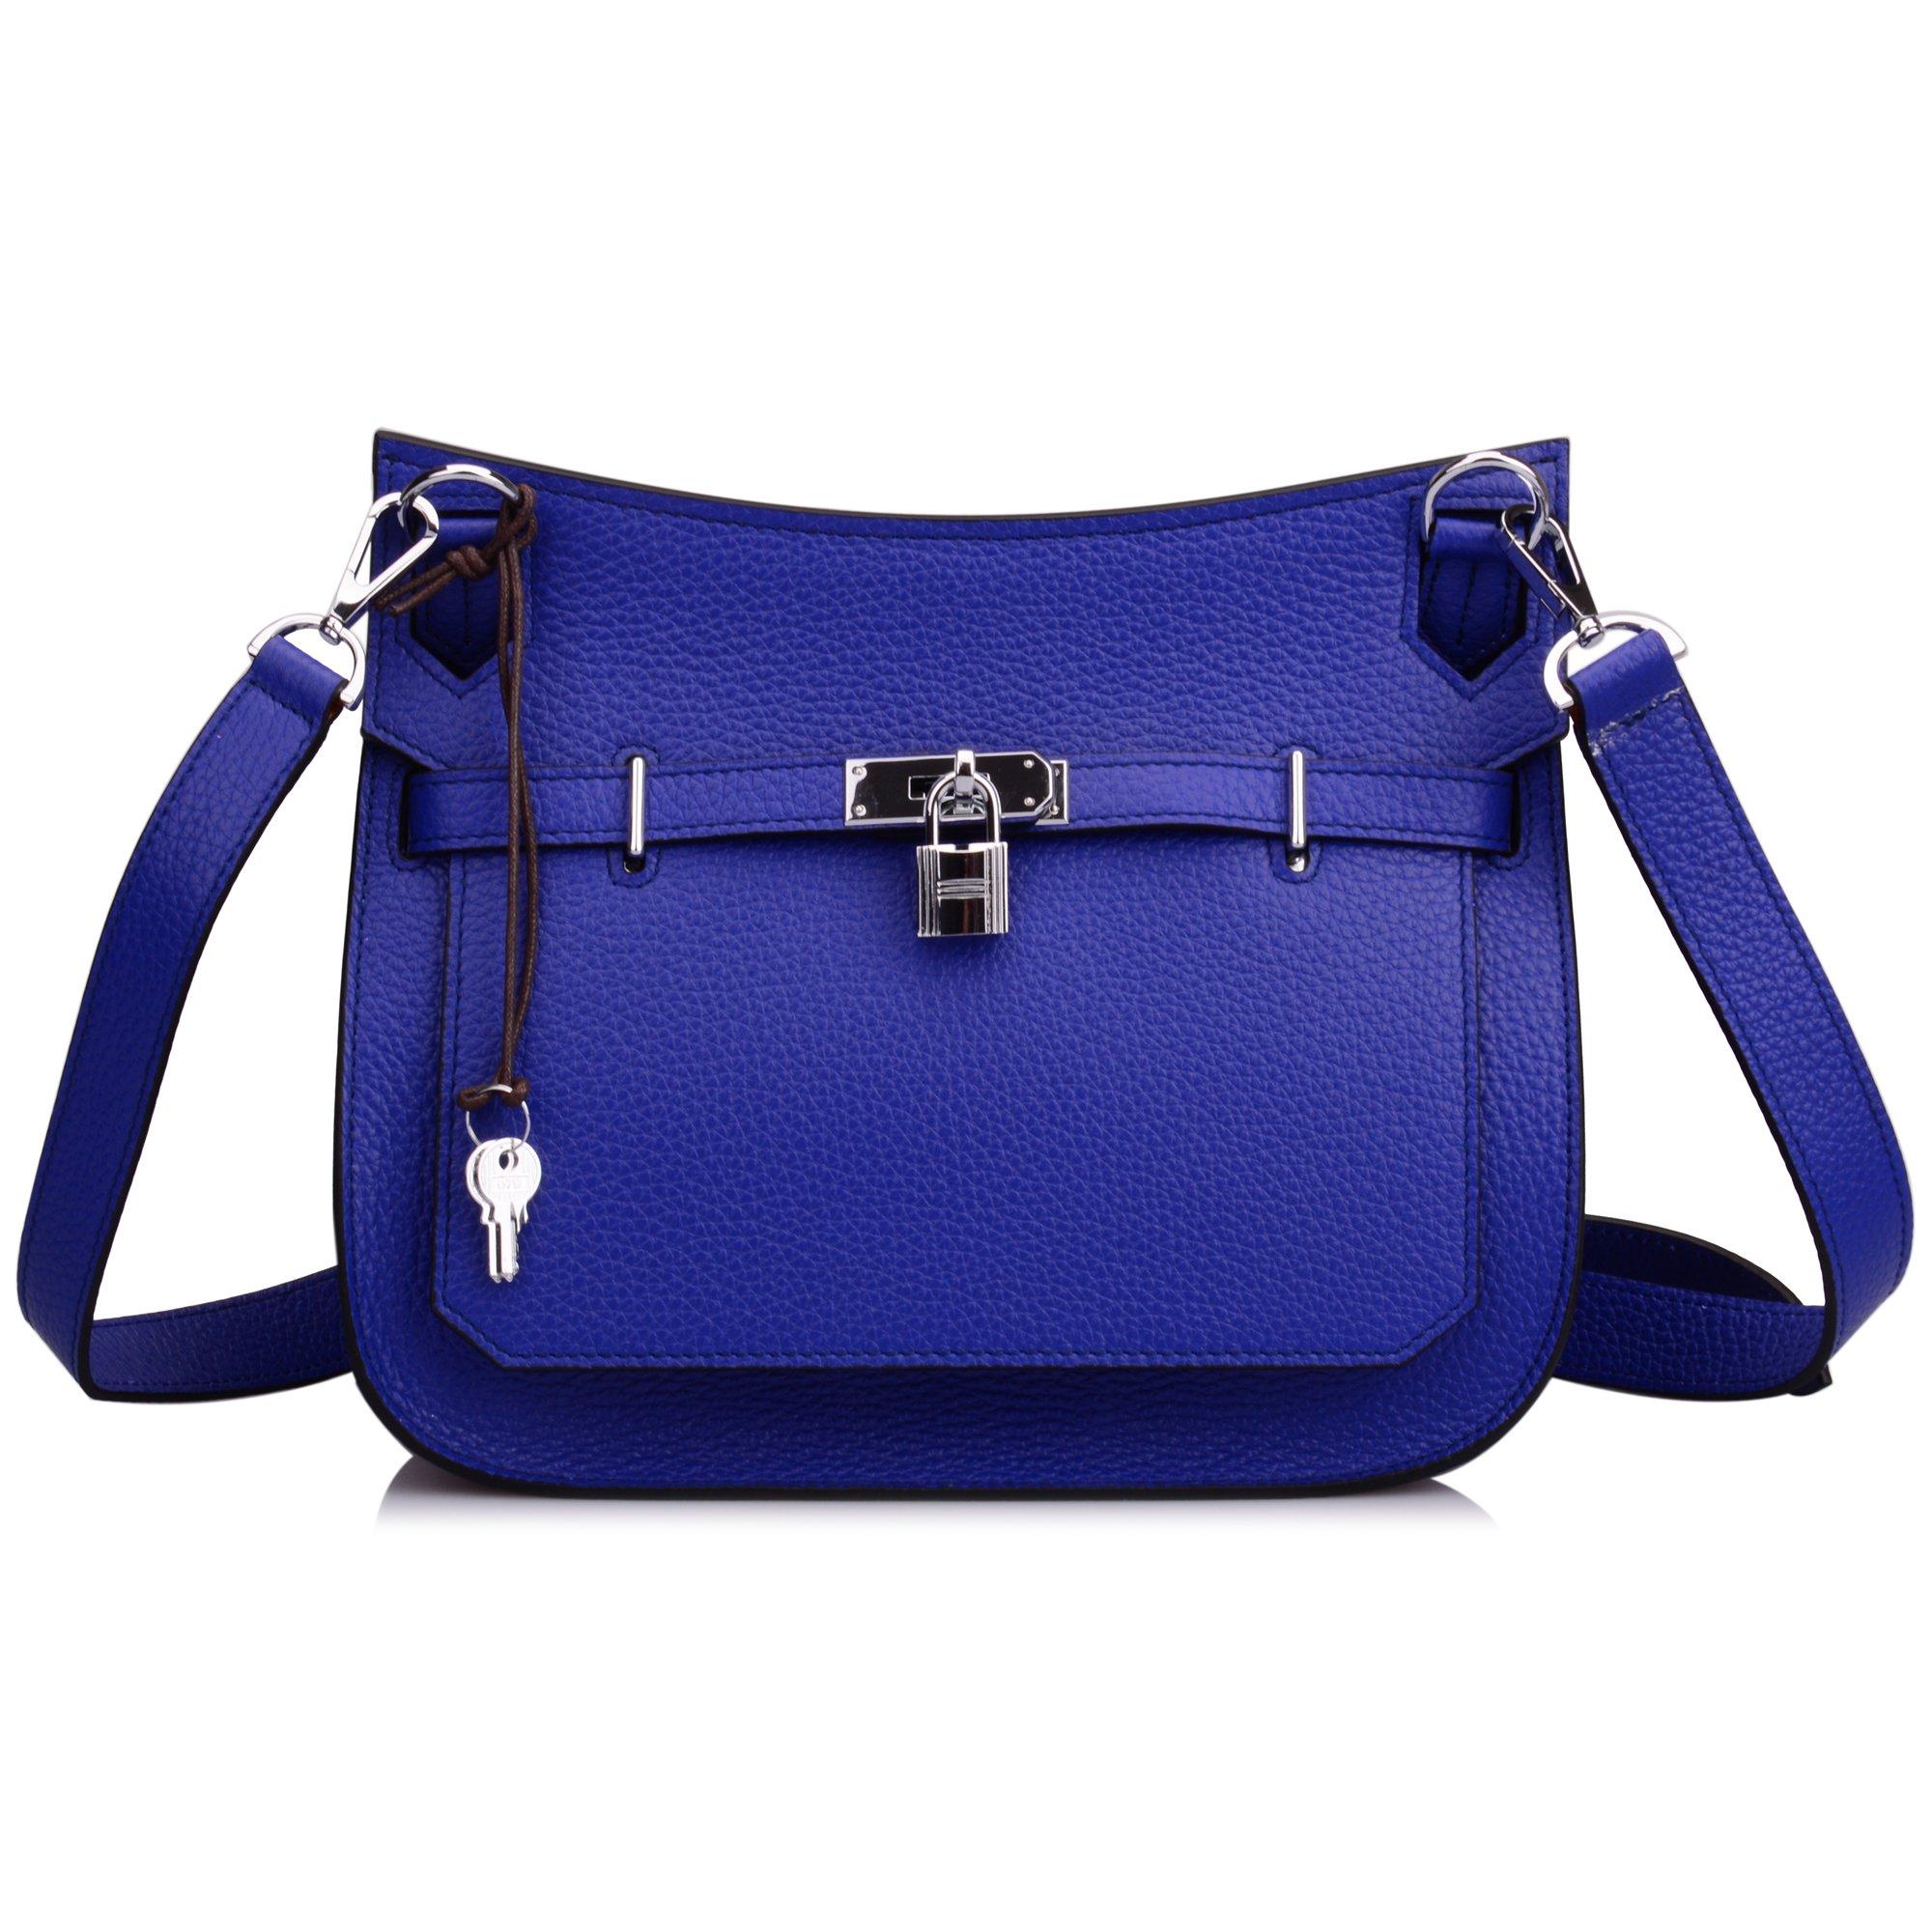 Ainifeel Women's Padlock Genuine Leather Messenger Bag Cross Body Bag Satchel Purse (Blue)